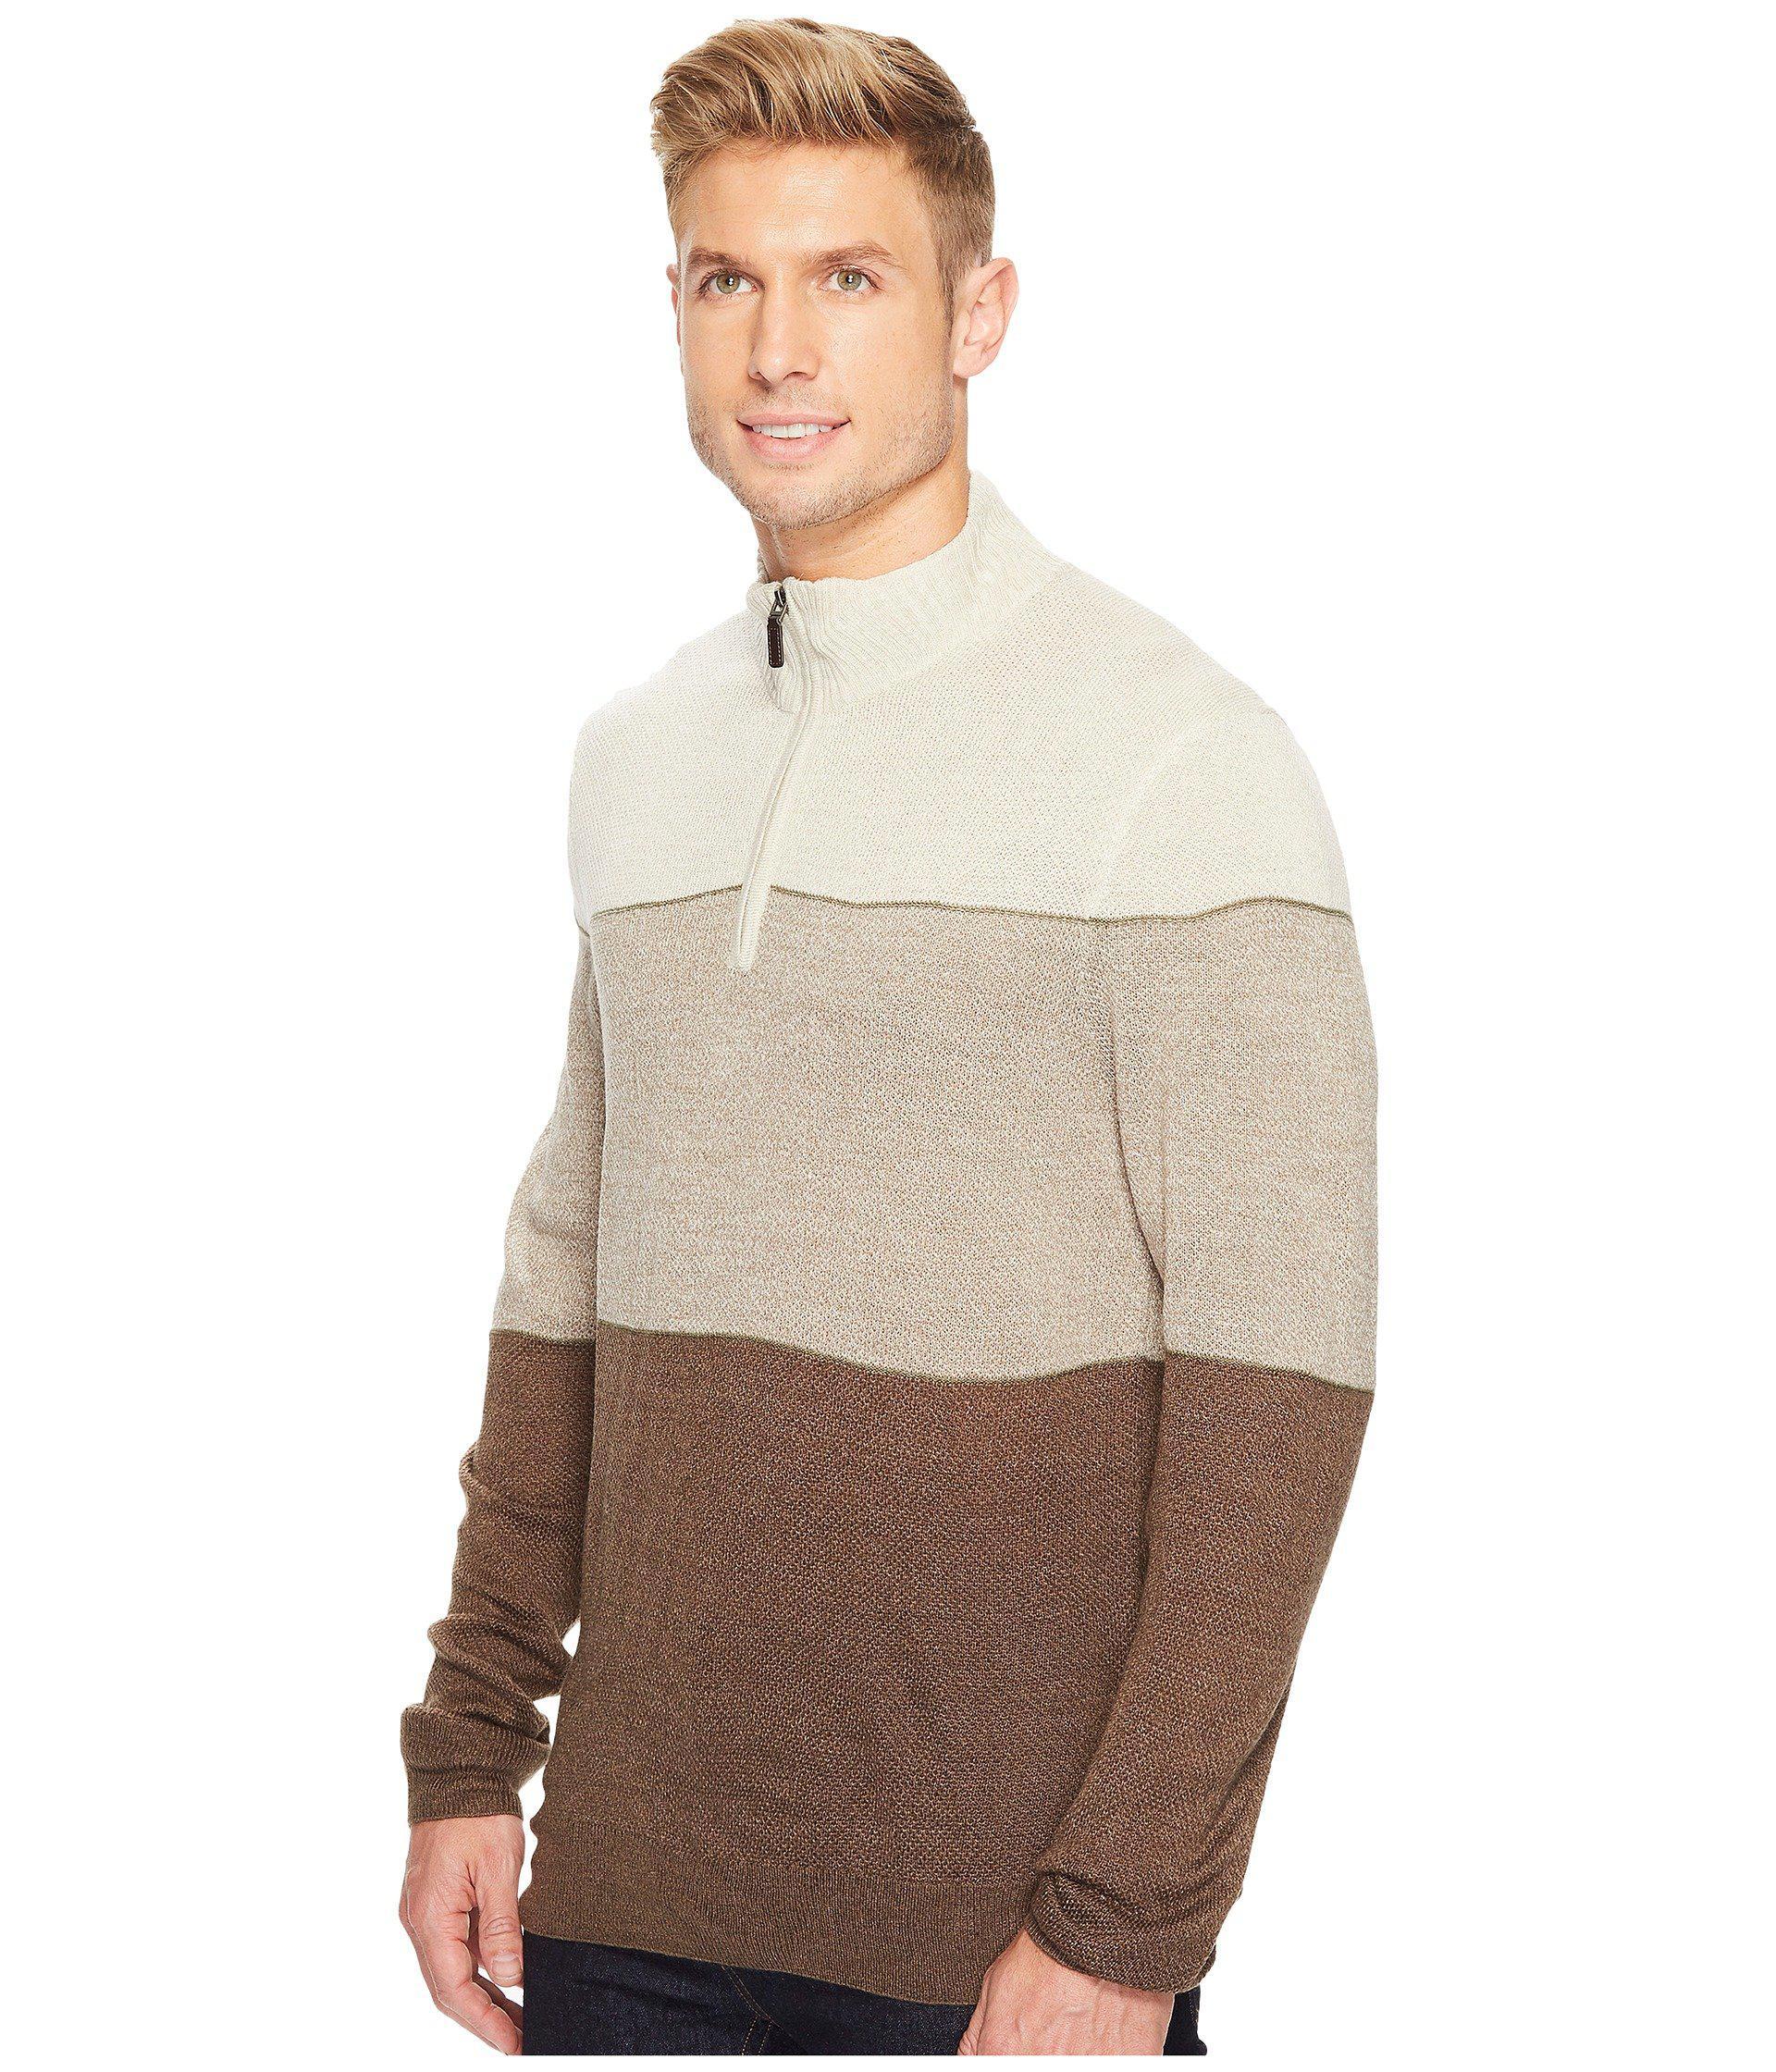 b60b595941f3 Lyst - Dockers Soft Acrylic Yarn-dye 1 4 Zip in Brown for Men - Save  33.33333333333333%